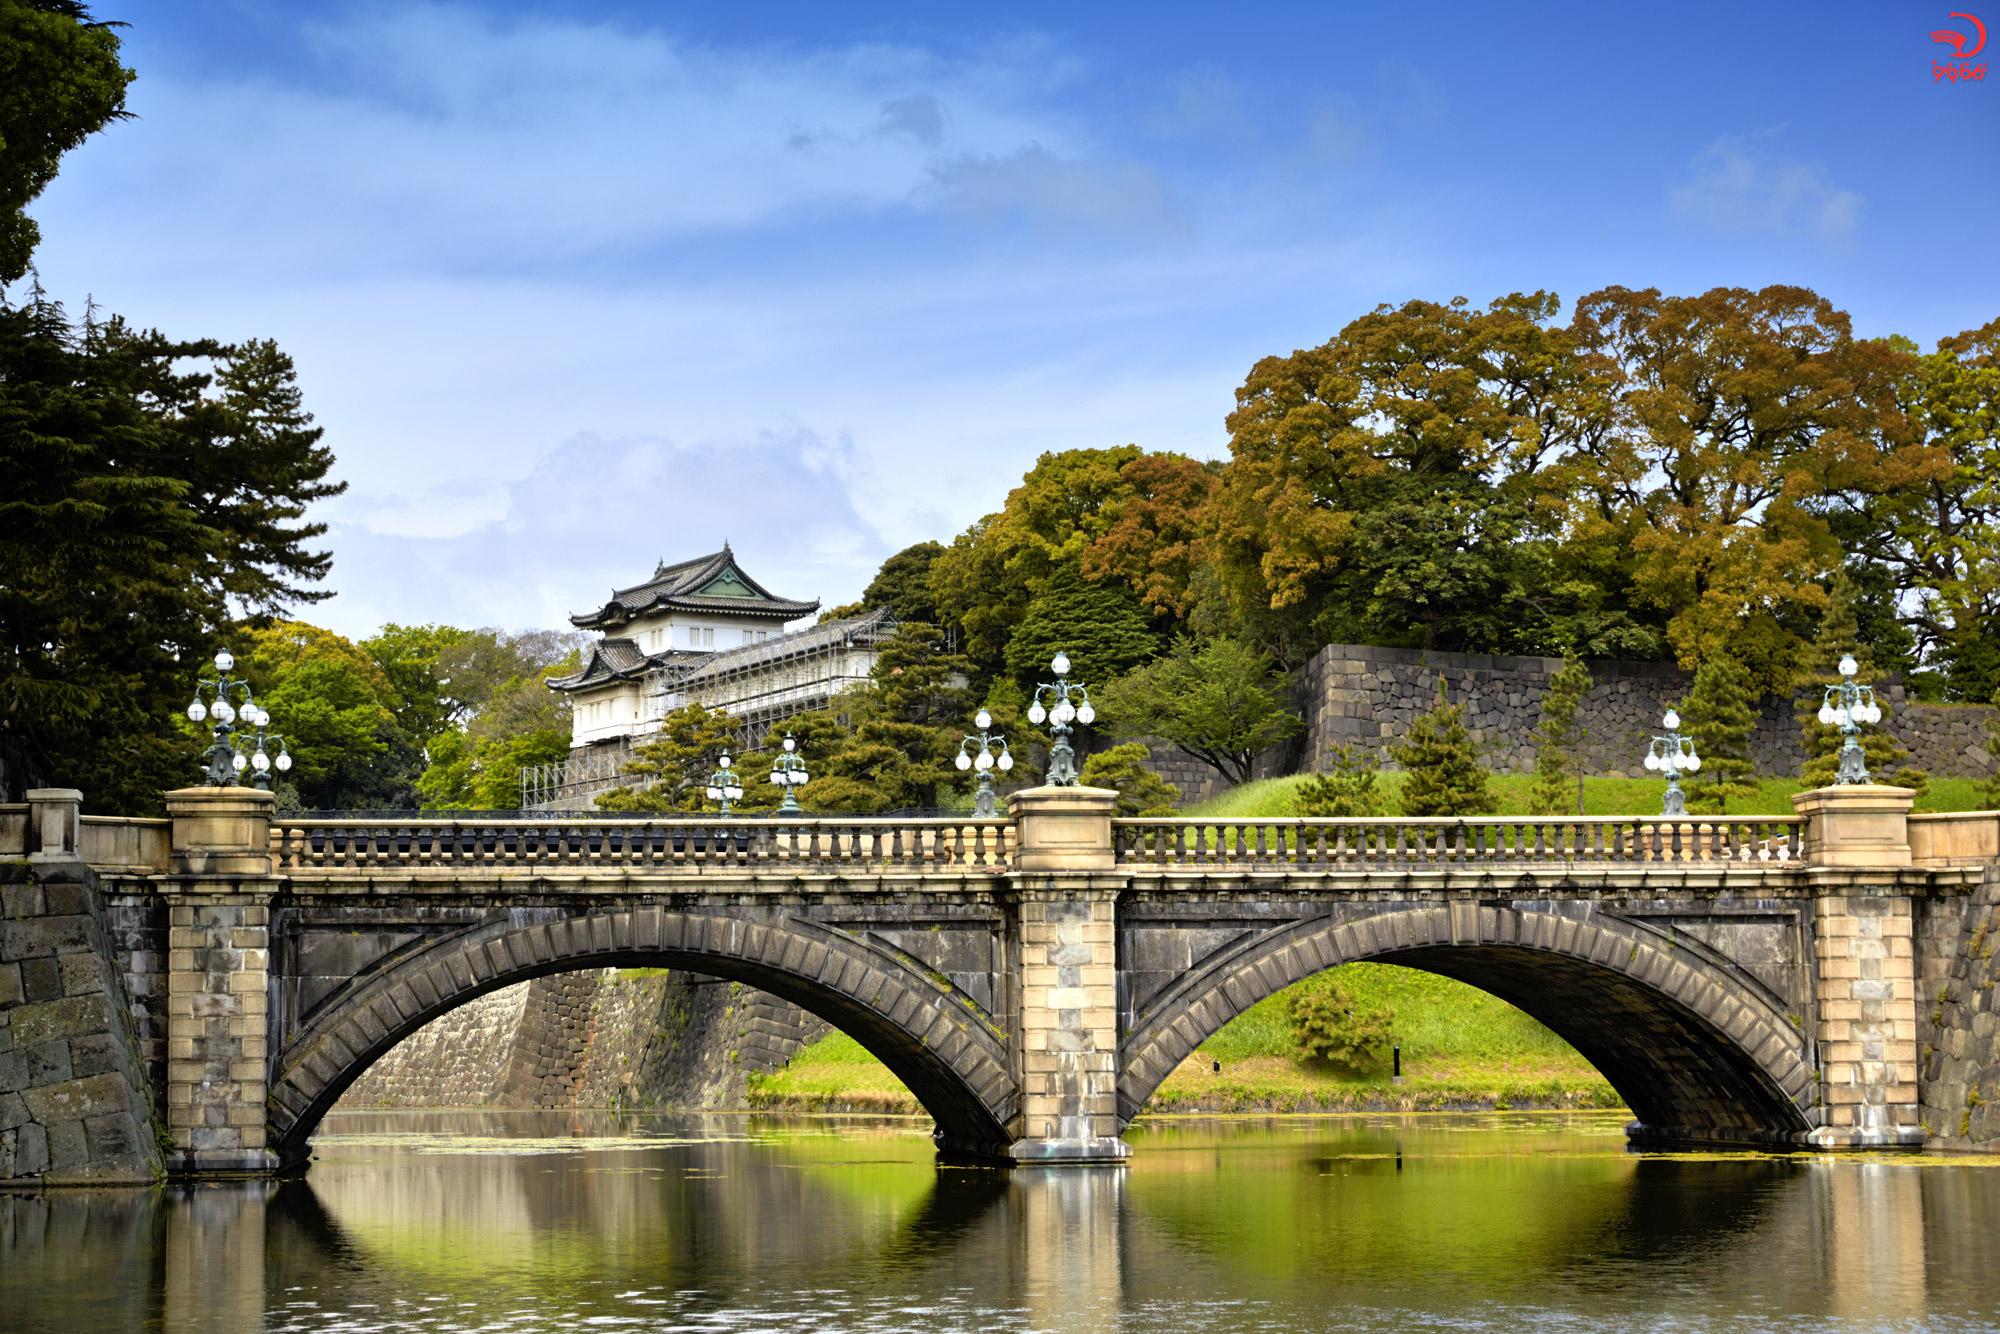 آشنایی با کاخ امپراتوری، توکیو